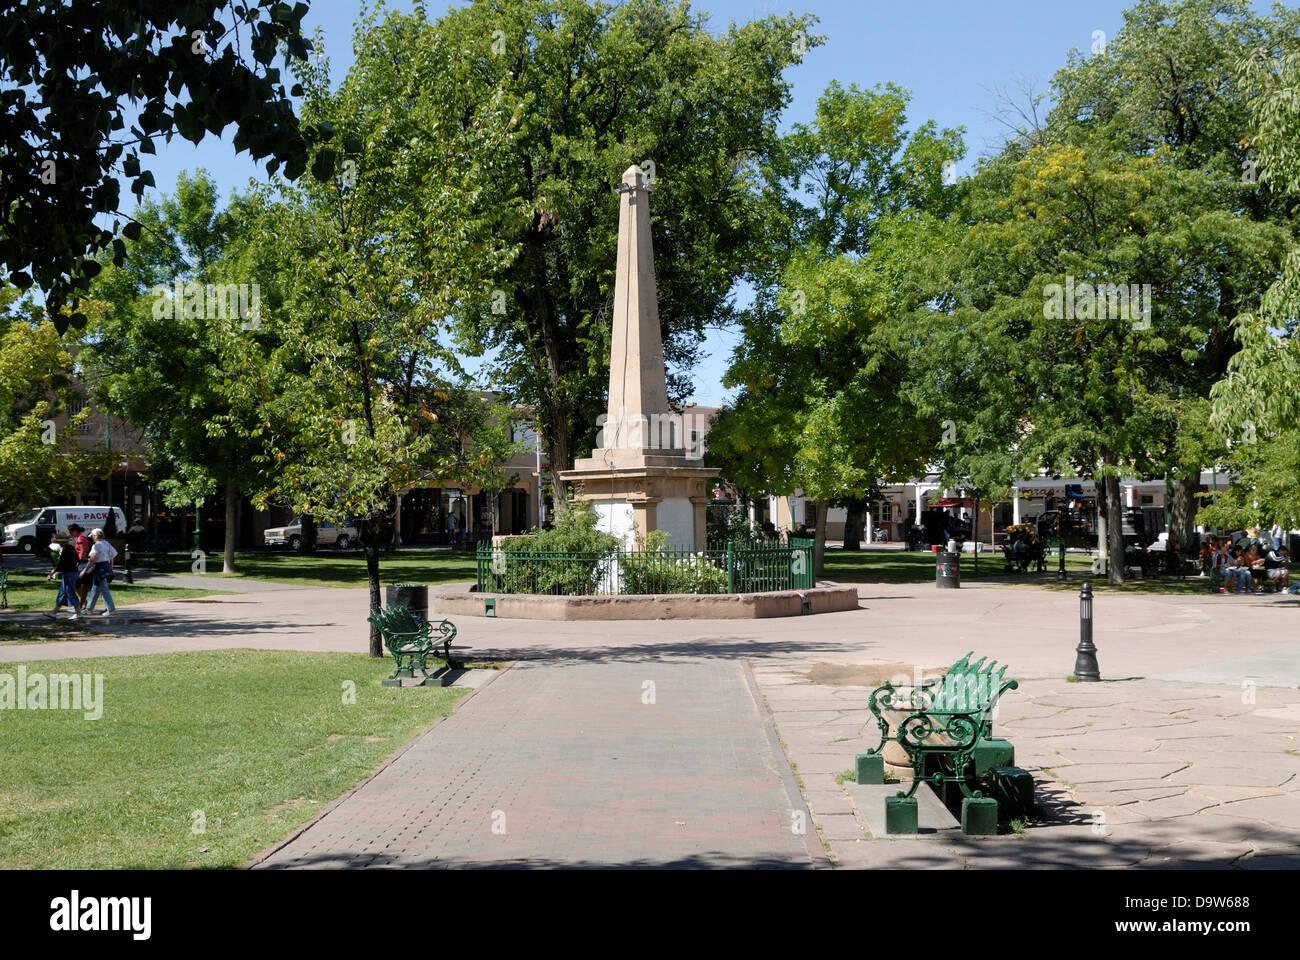 Obelisk In A Park Santa Fe Plaza Santa Fe New Mexico Usa Stock Photo Alamy